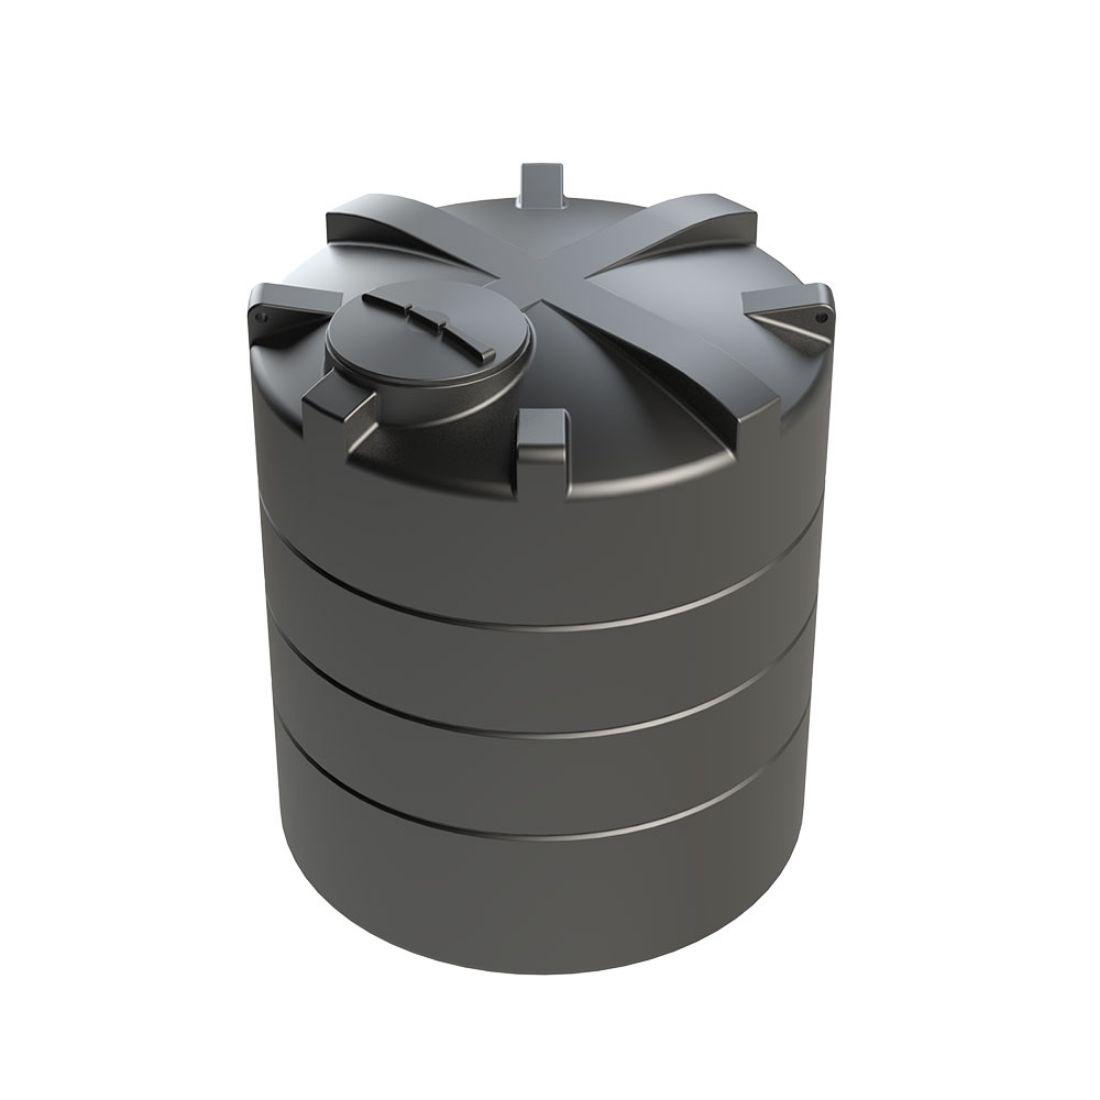 Enduramaxx 5,000 Litre Vertical Potable WRAS Water Storage Tank